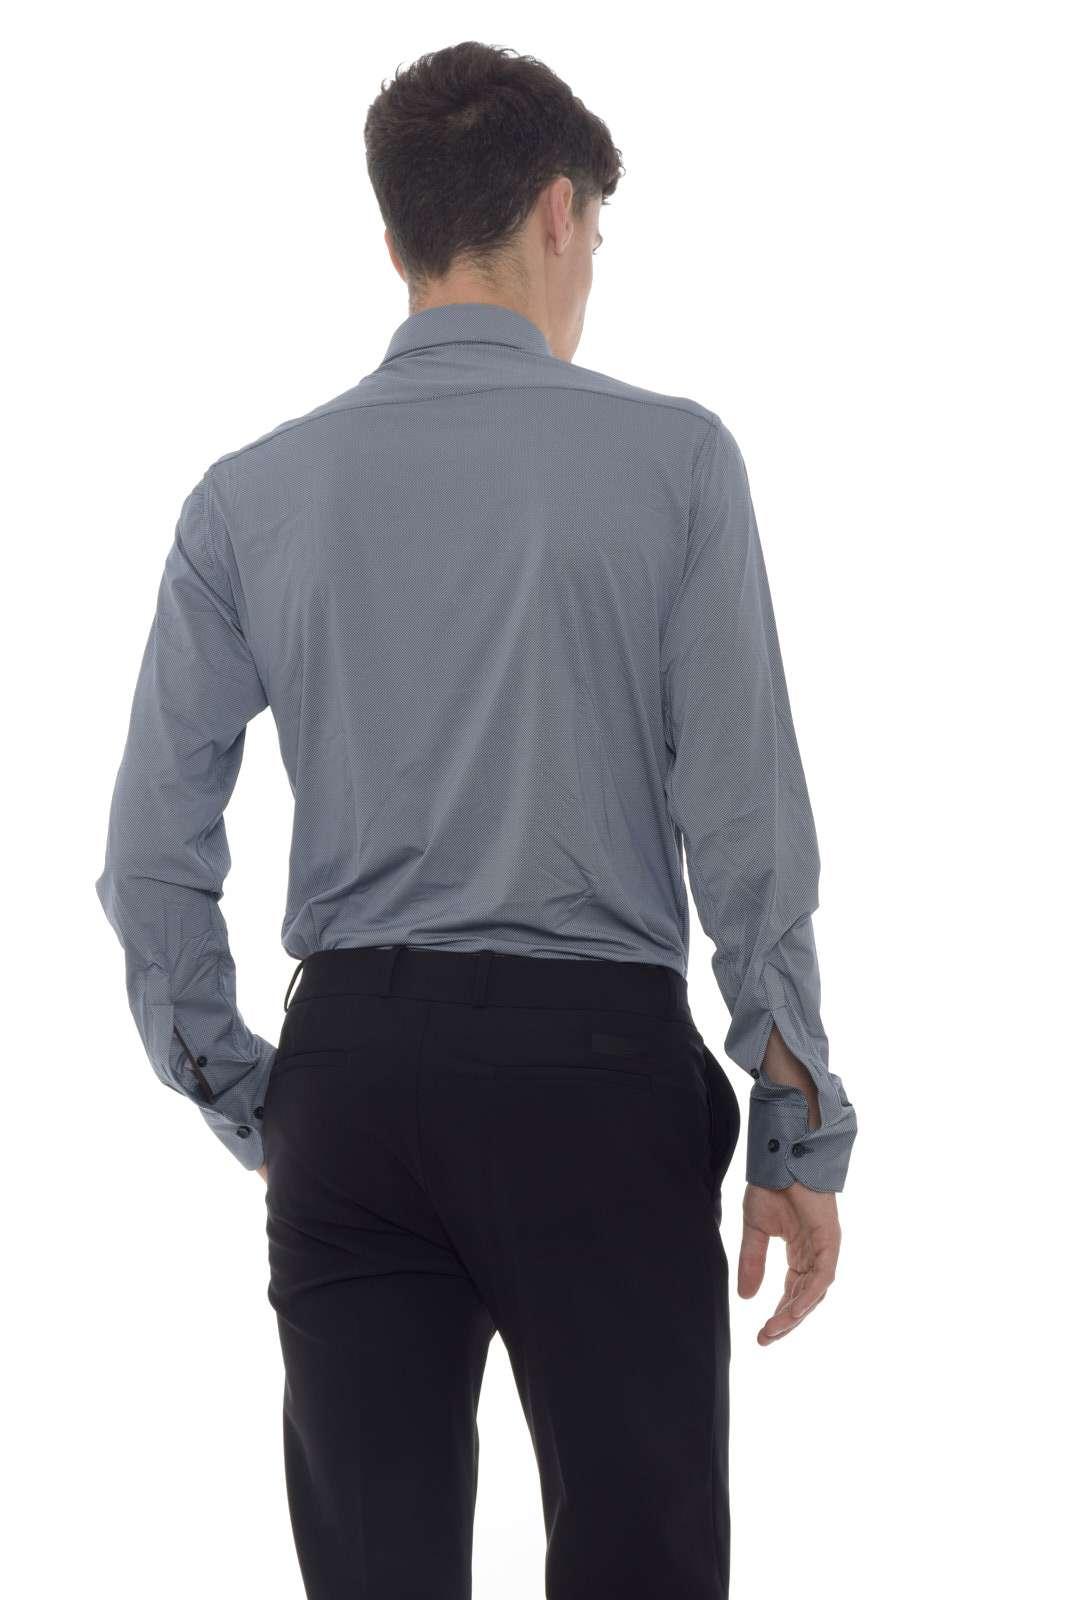 https://www.parmax.com/media/catalog/product/a/i/AI-outlet_parmax-camicia-uomo-RRD-W19255-C.jpg